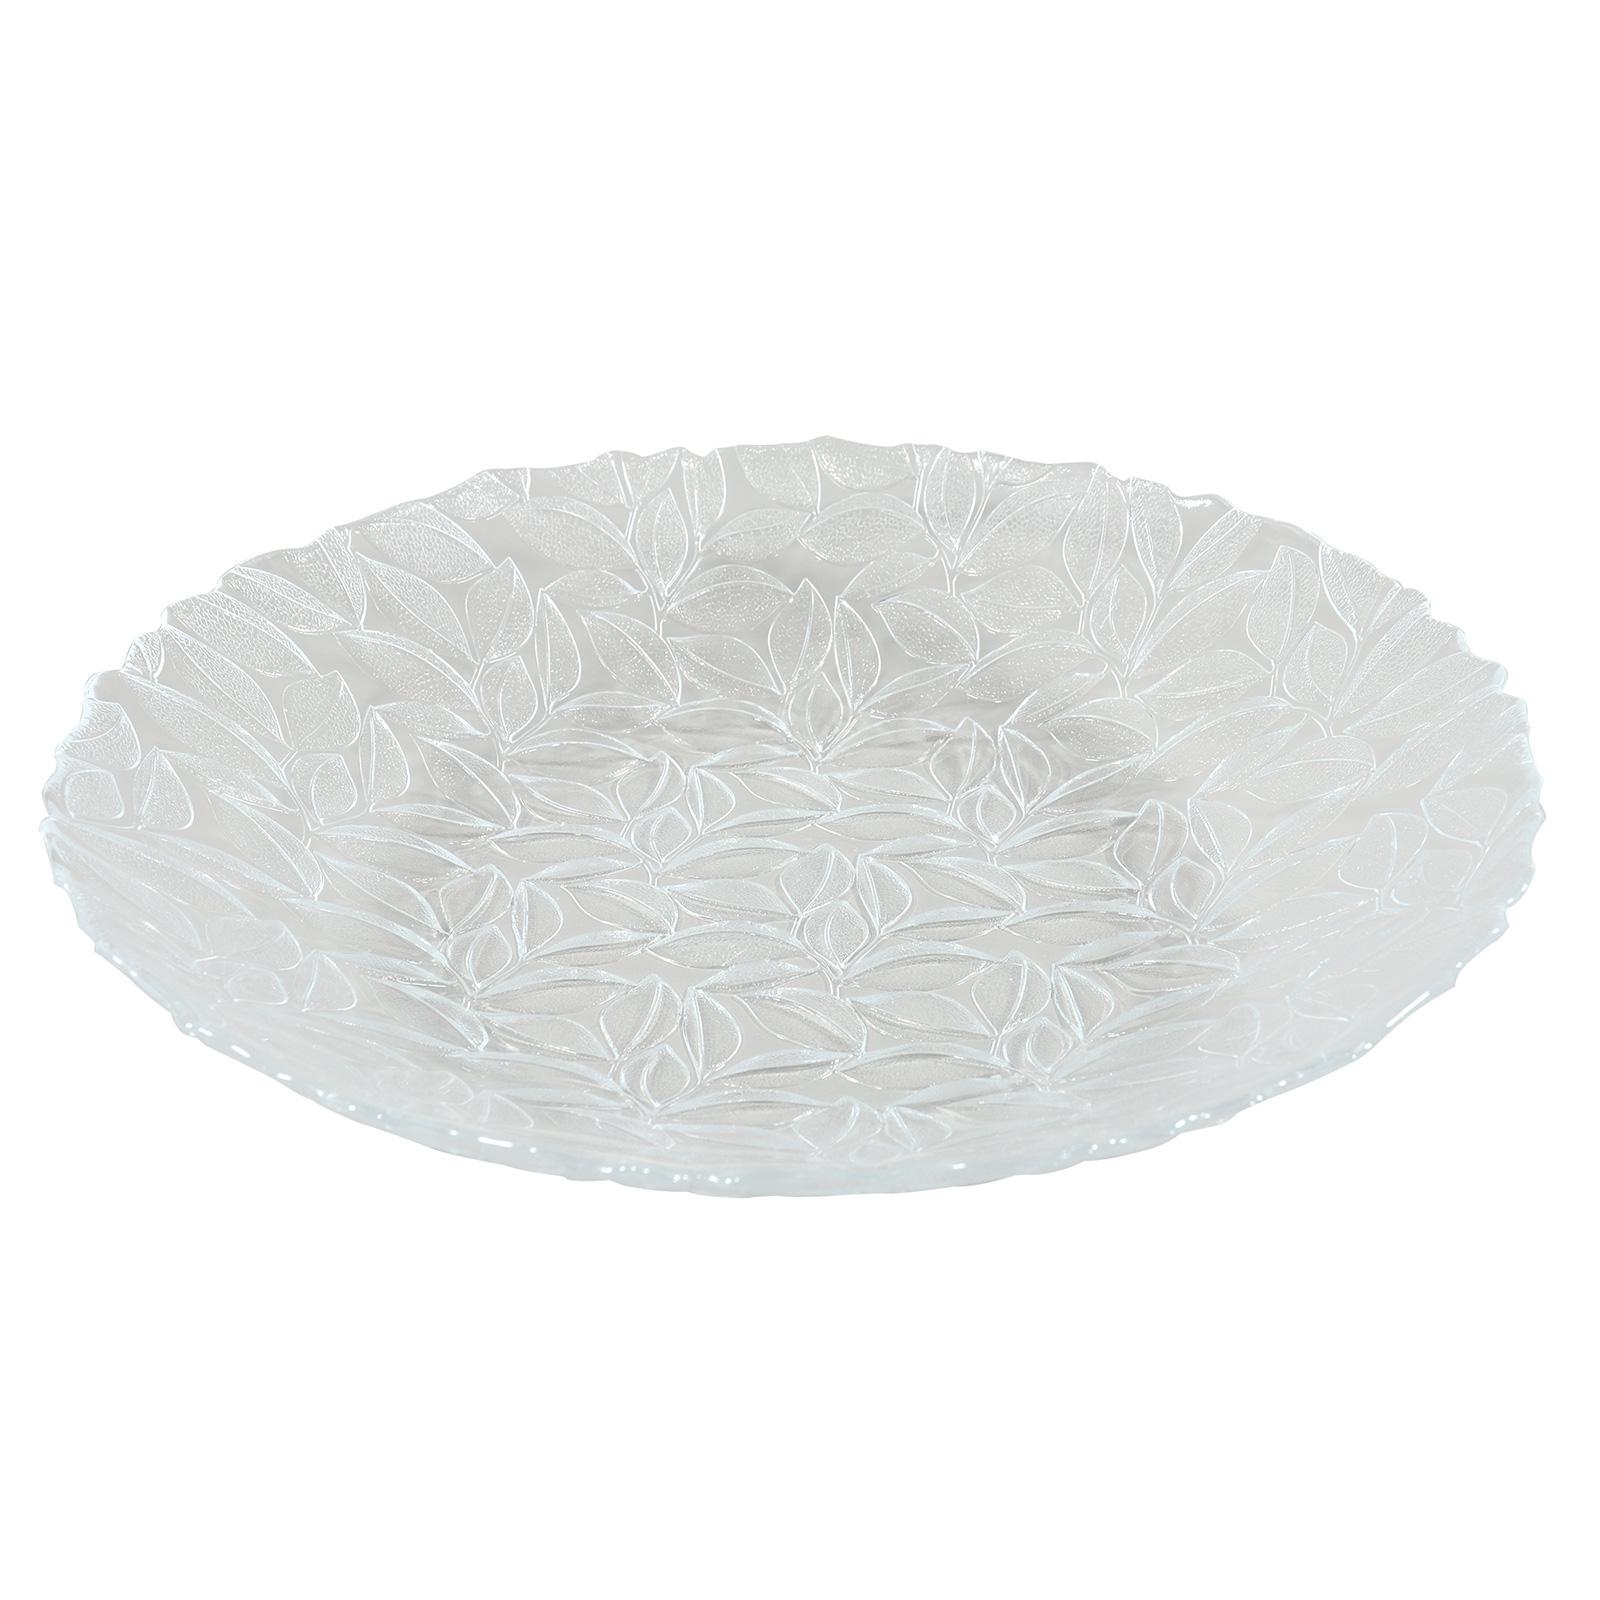 Centre de table en verre pressé 40 cm